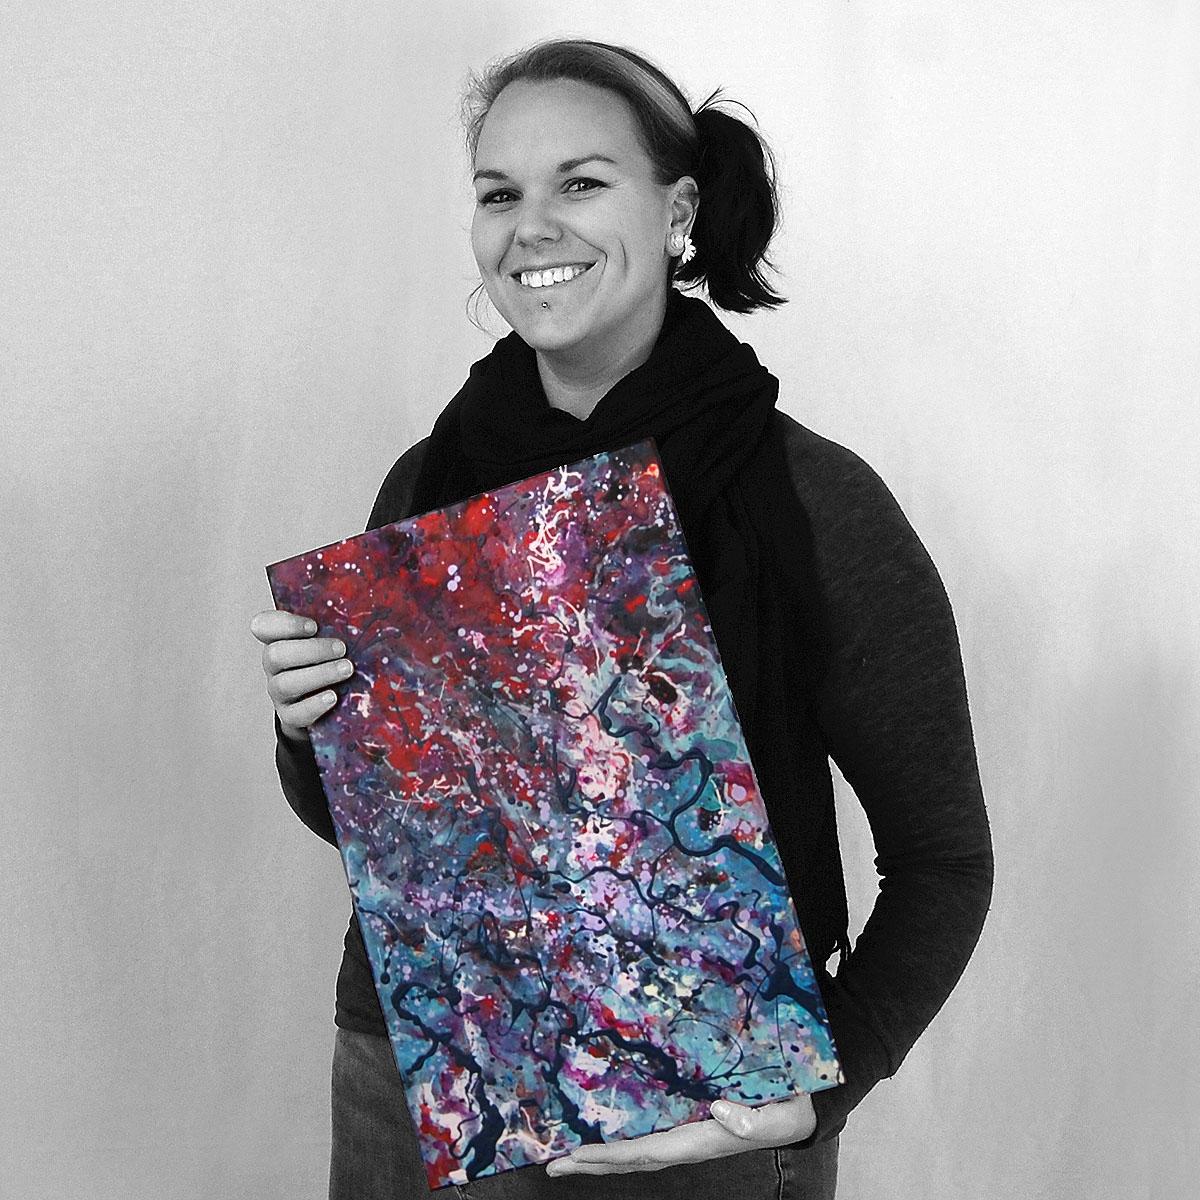 Kelsey. Artist. Landscape architect. Nature lover. Amateur percussionist. Wine lover.